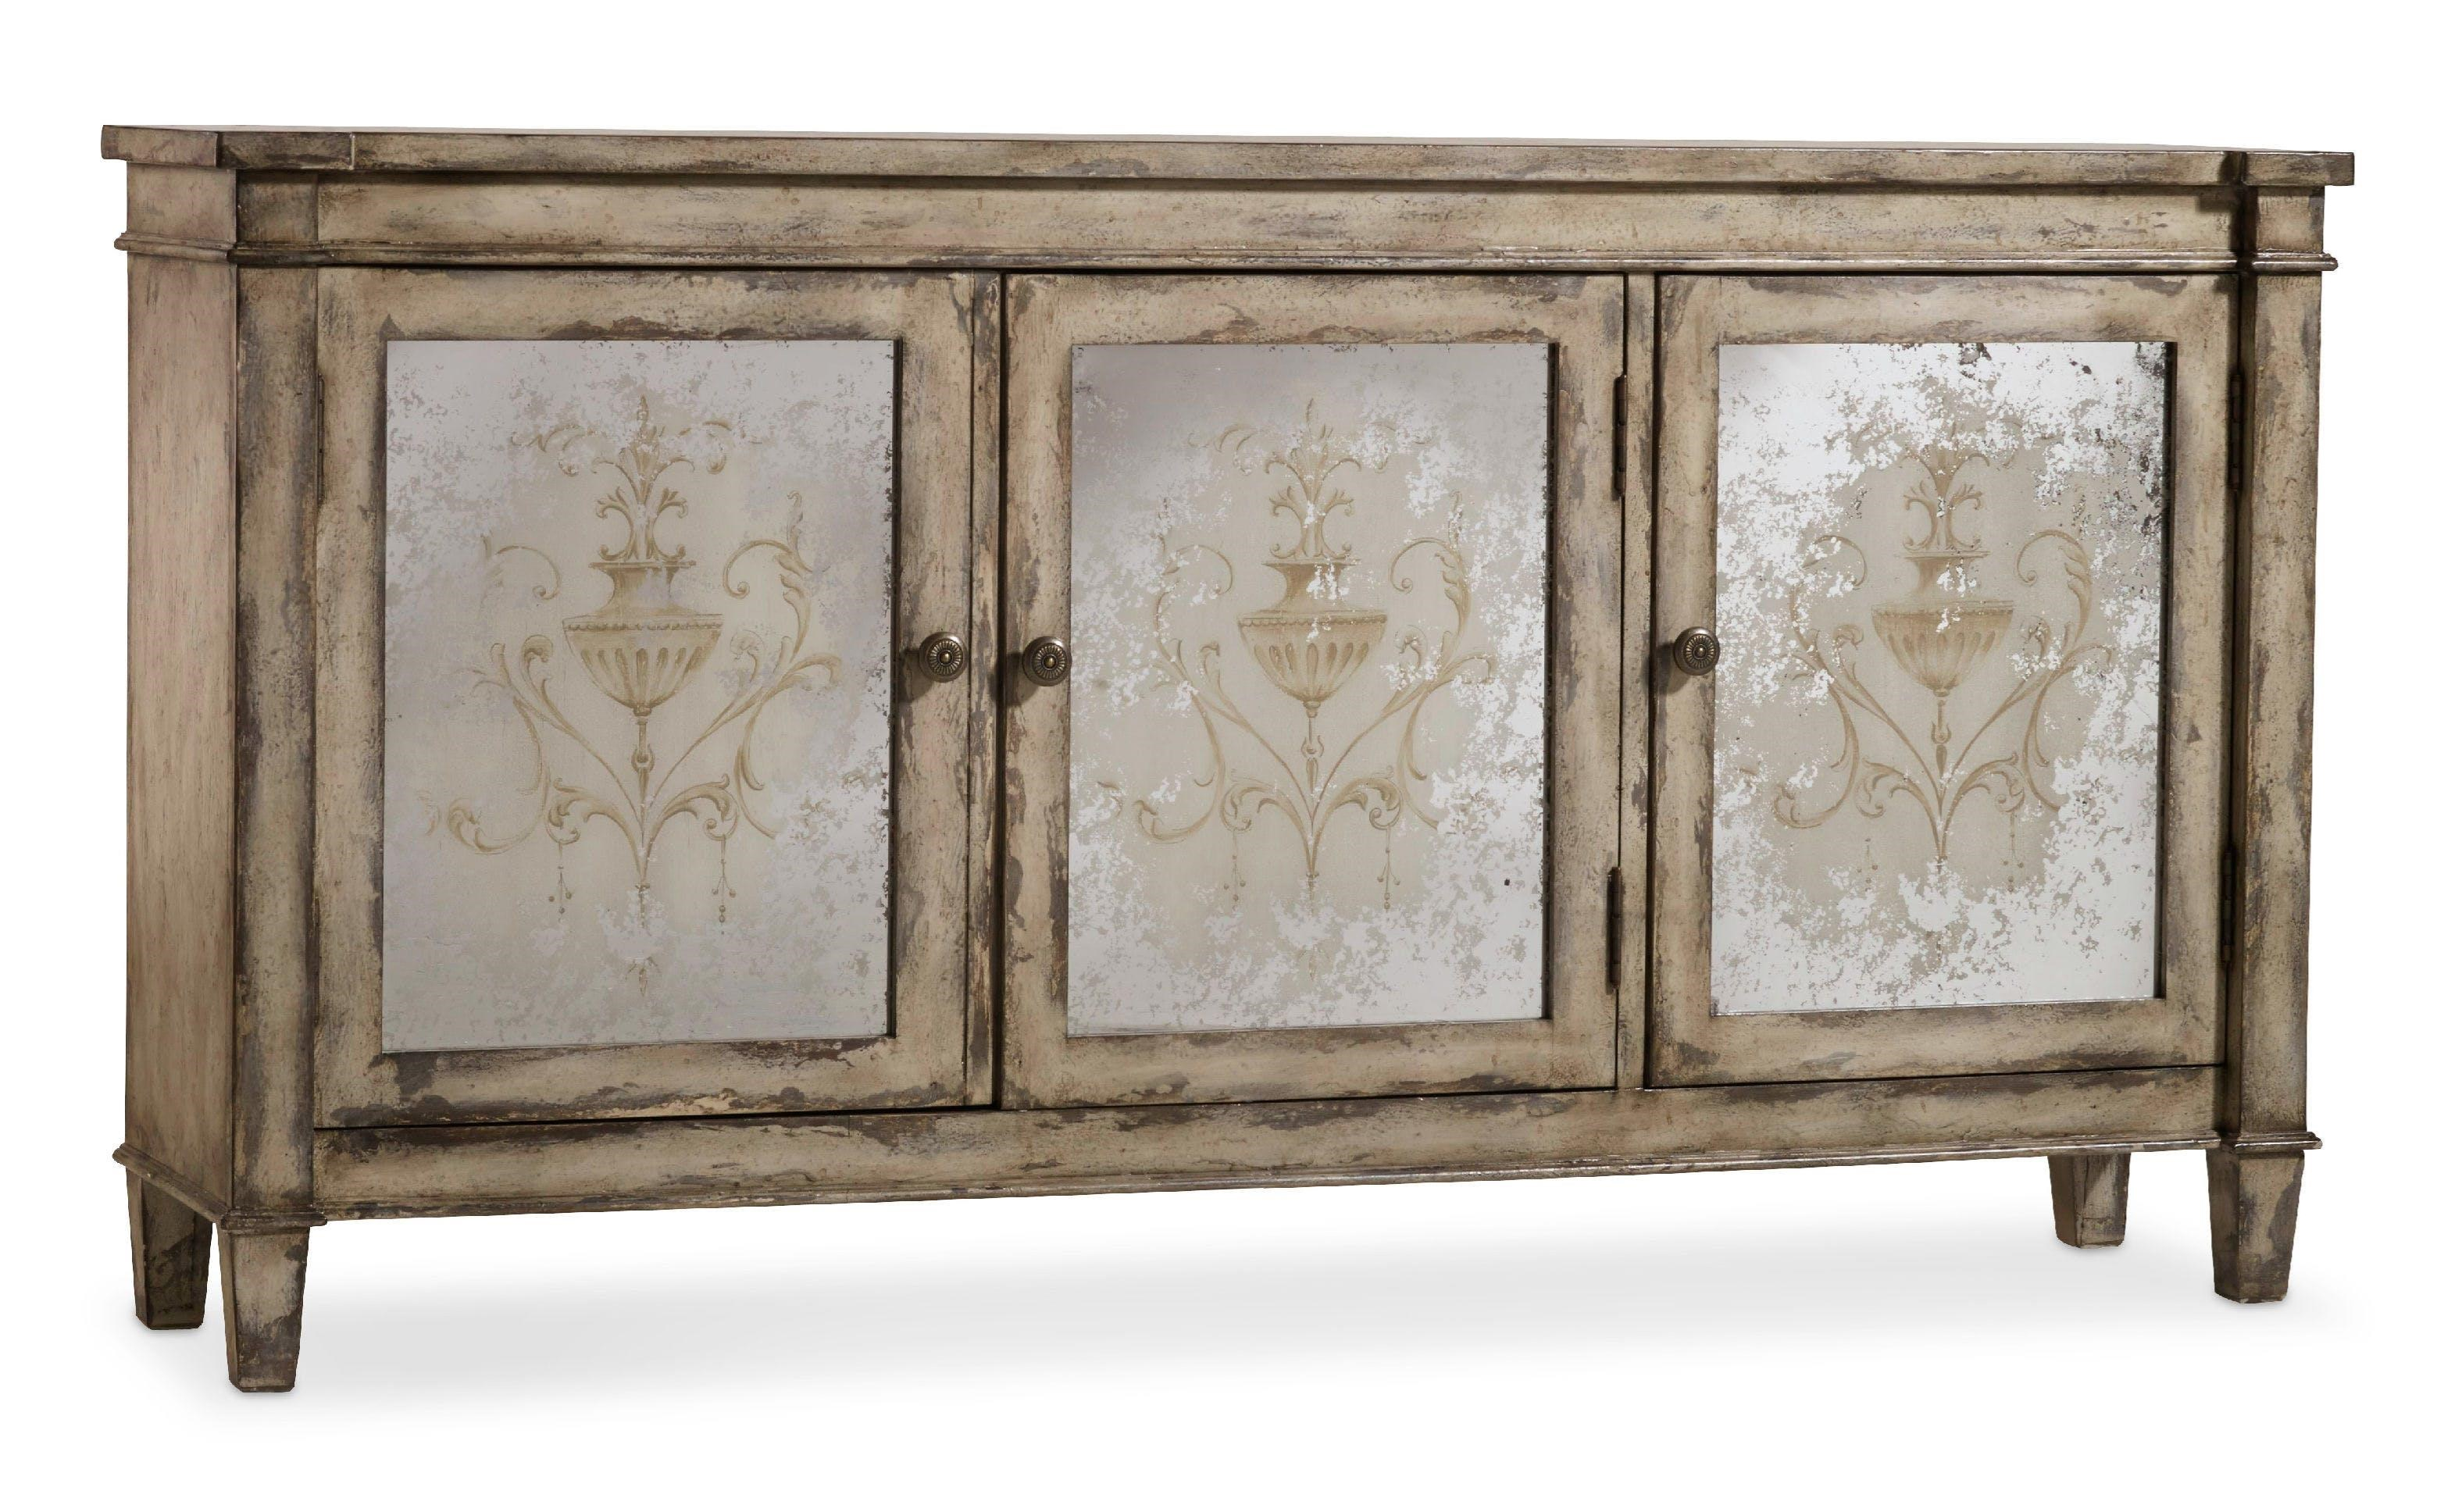 Hooker Furniture 5316-Moselle Chest - Item Number: 5316-85001